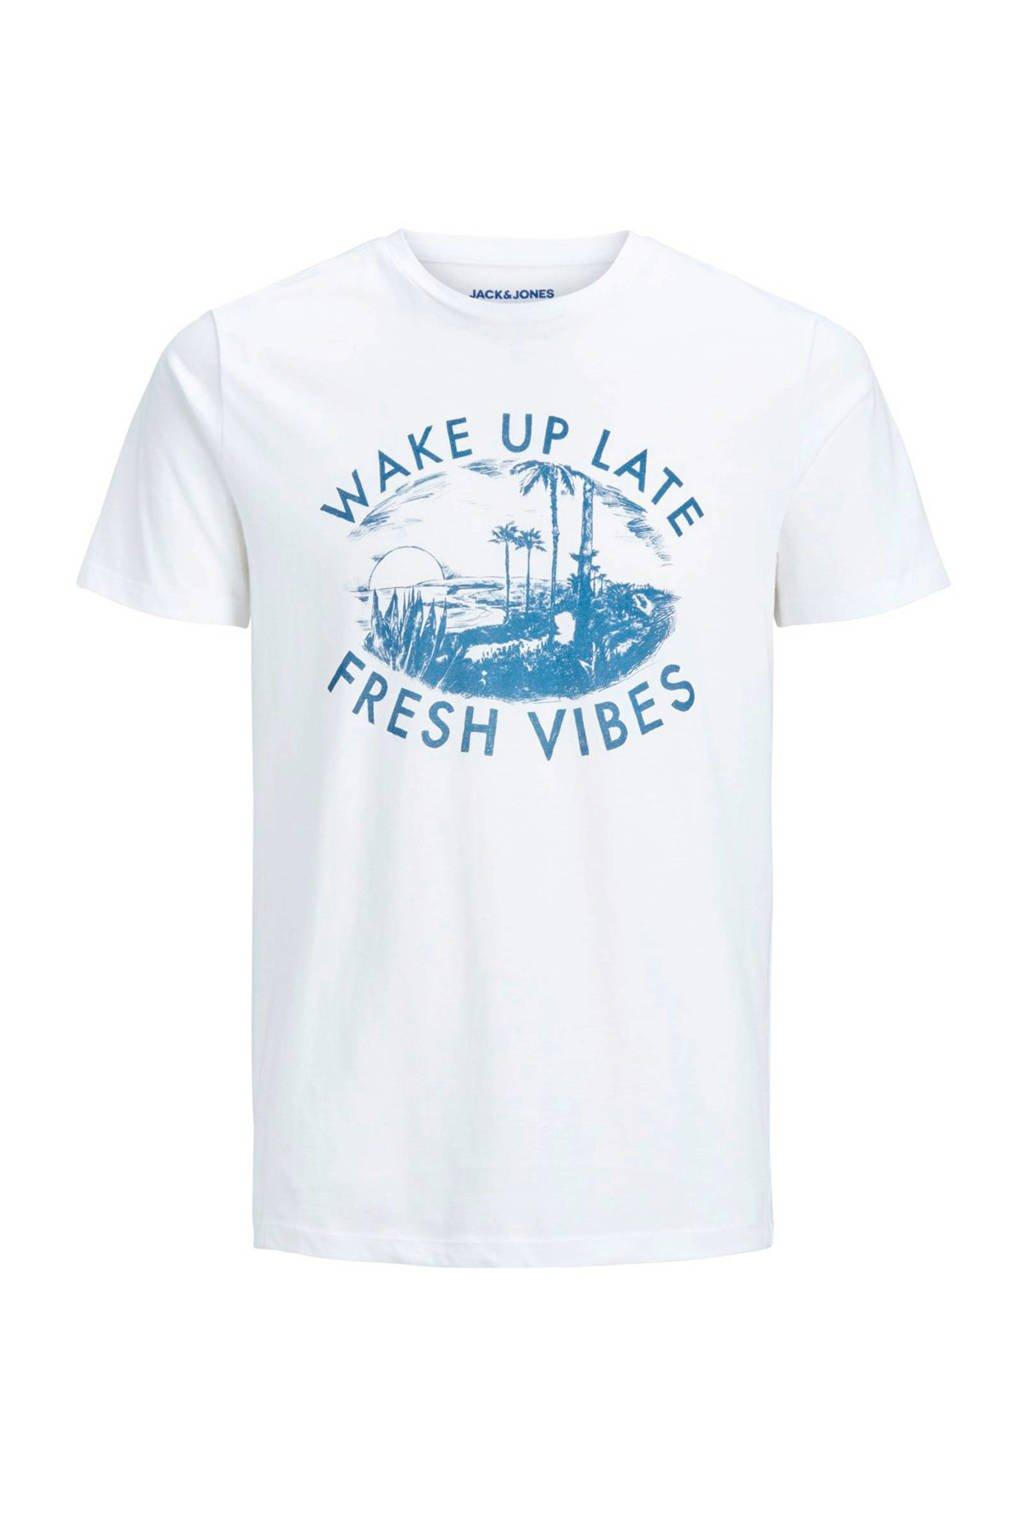 Jack & Jones Junior T-shirt Sunbaked wit, Wit